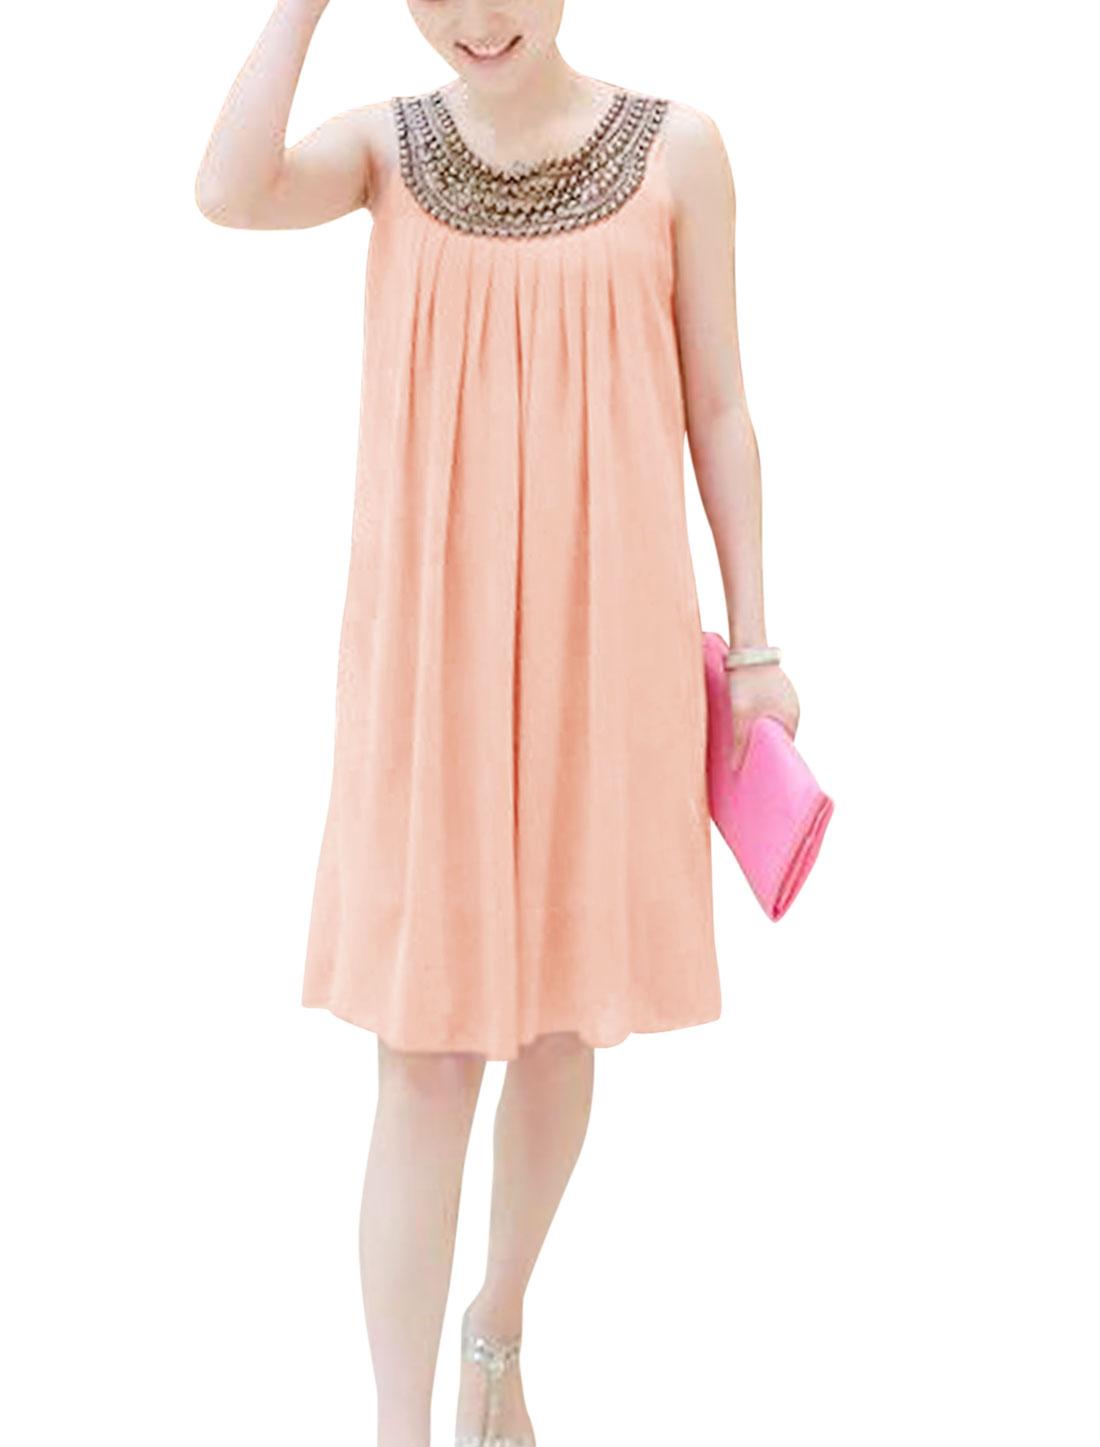 Lady Round Neck Sleeveless Beads Decor Leisure Dress Pink XS